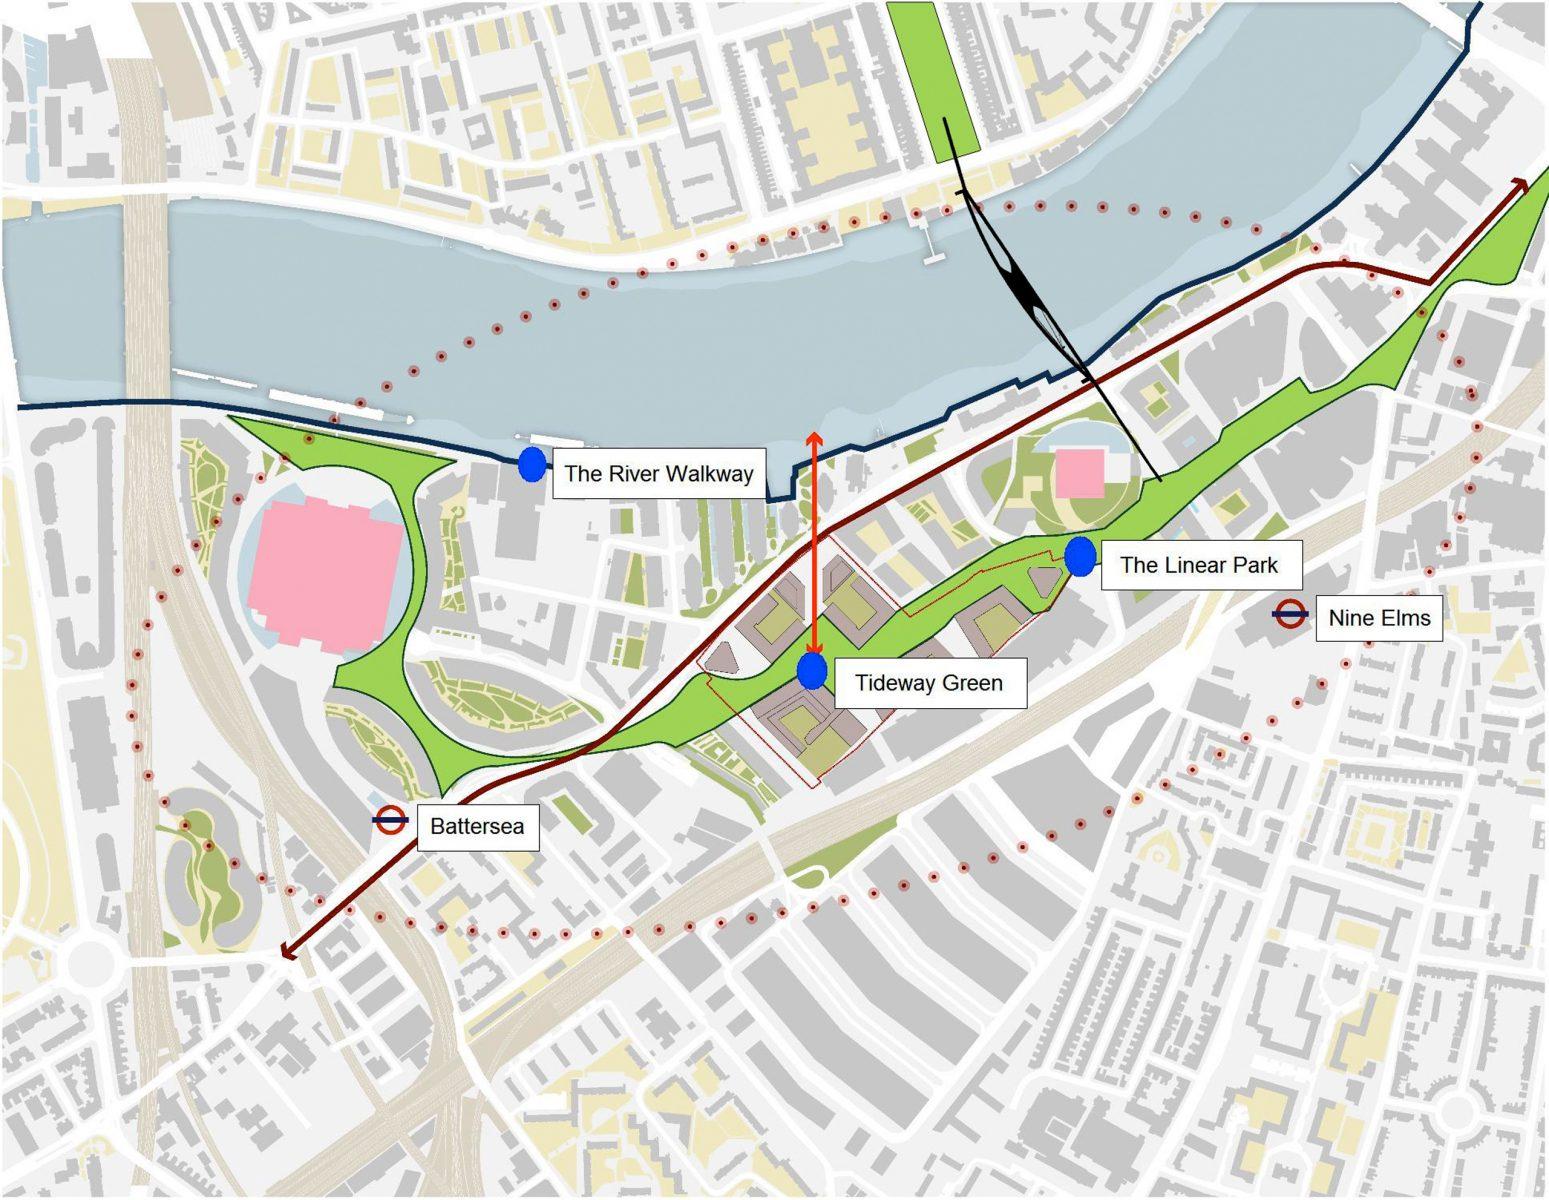 nine elms bridge london riba competition architects jersey architects6